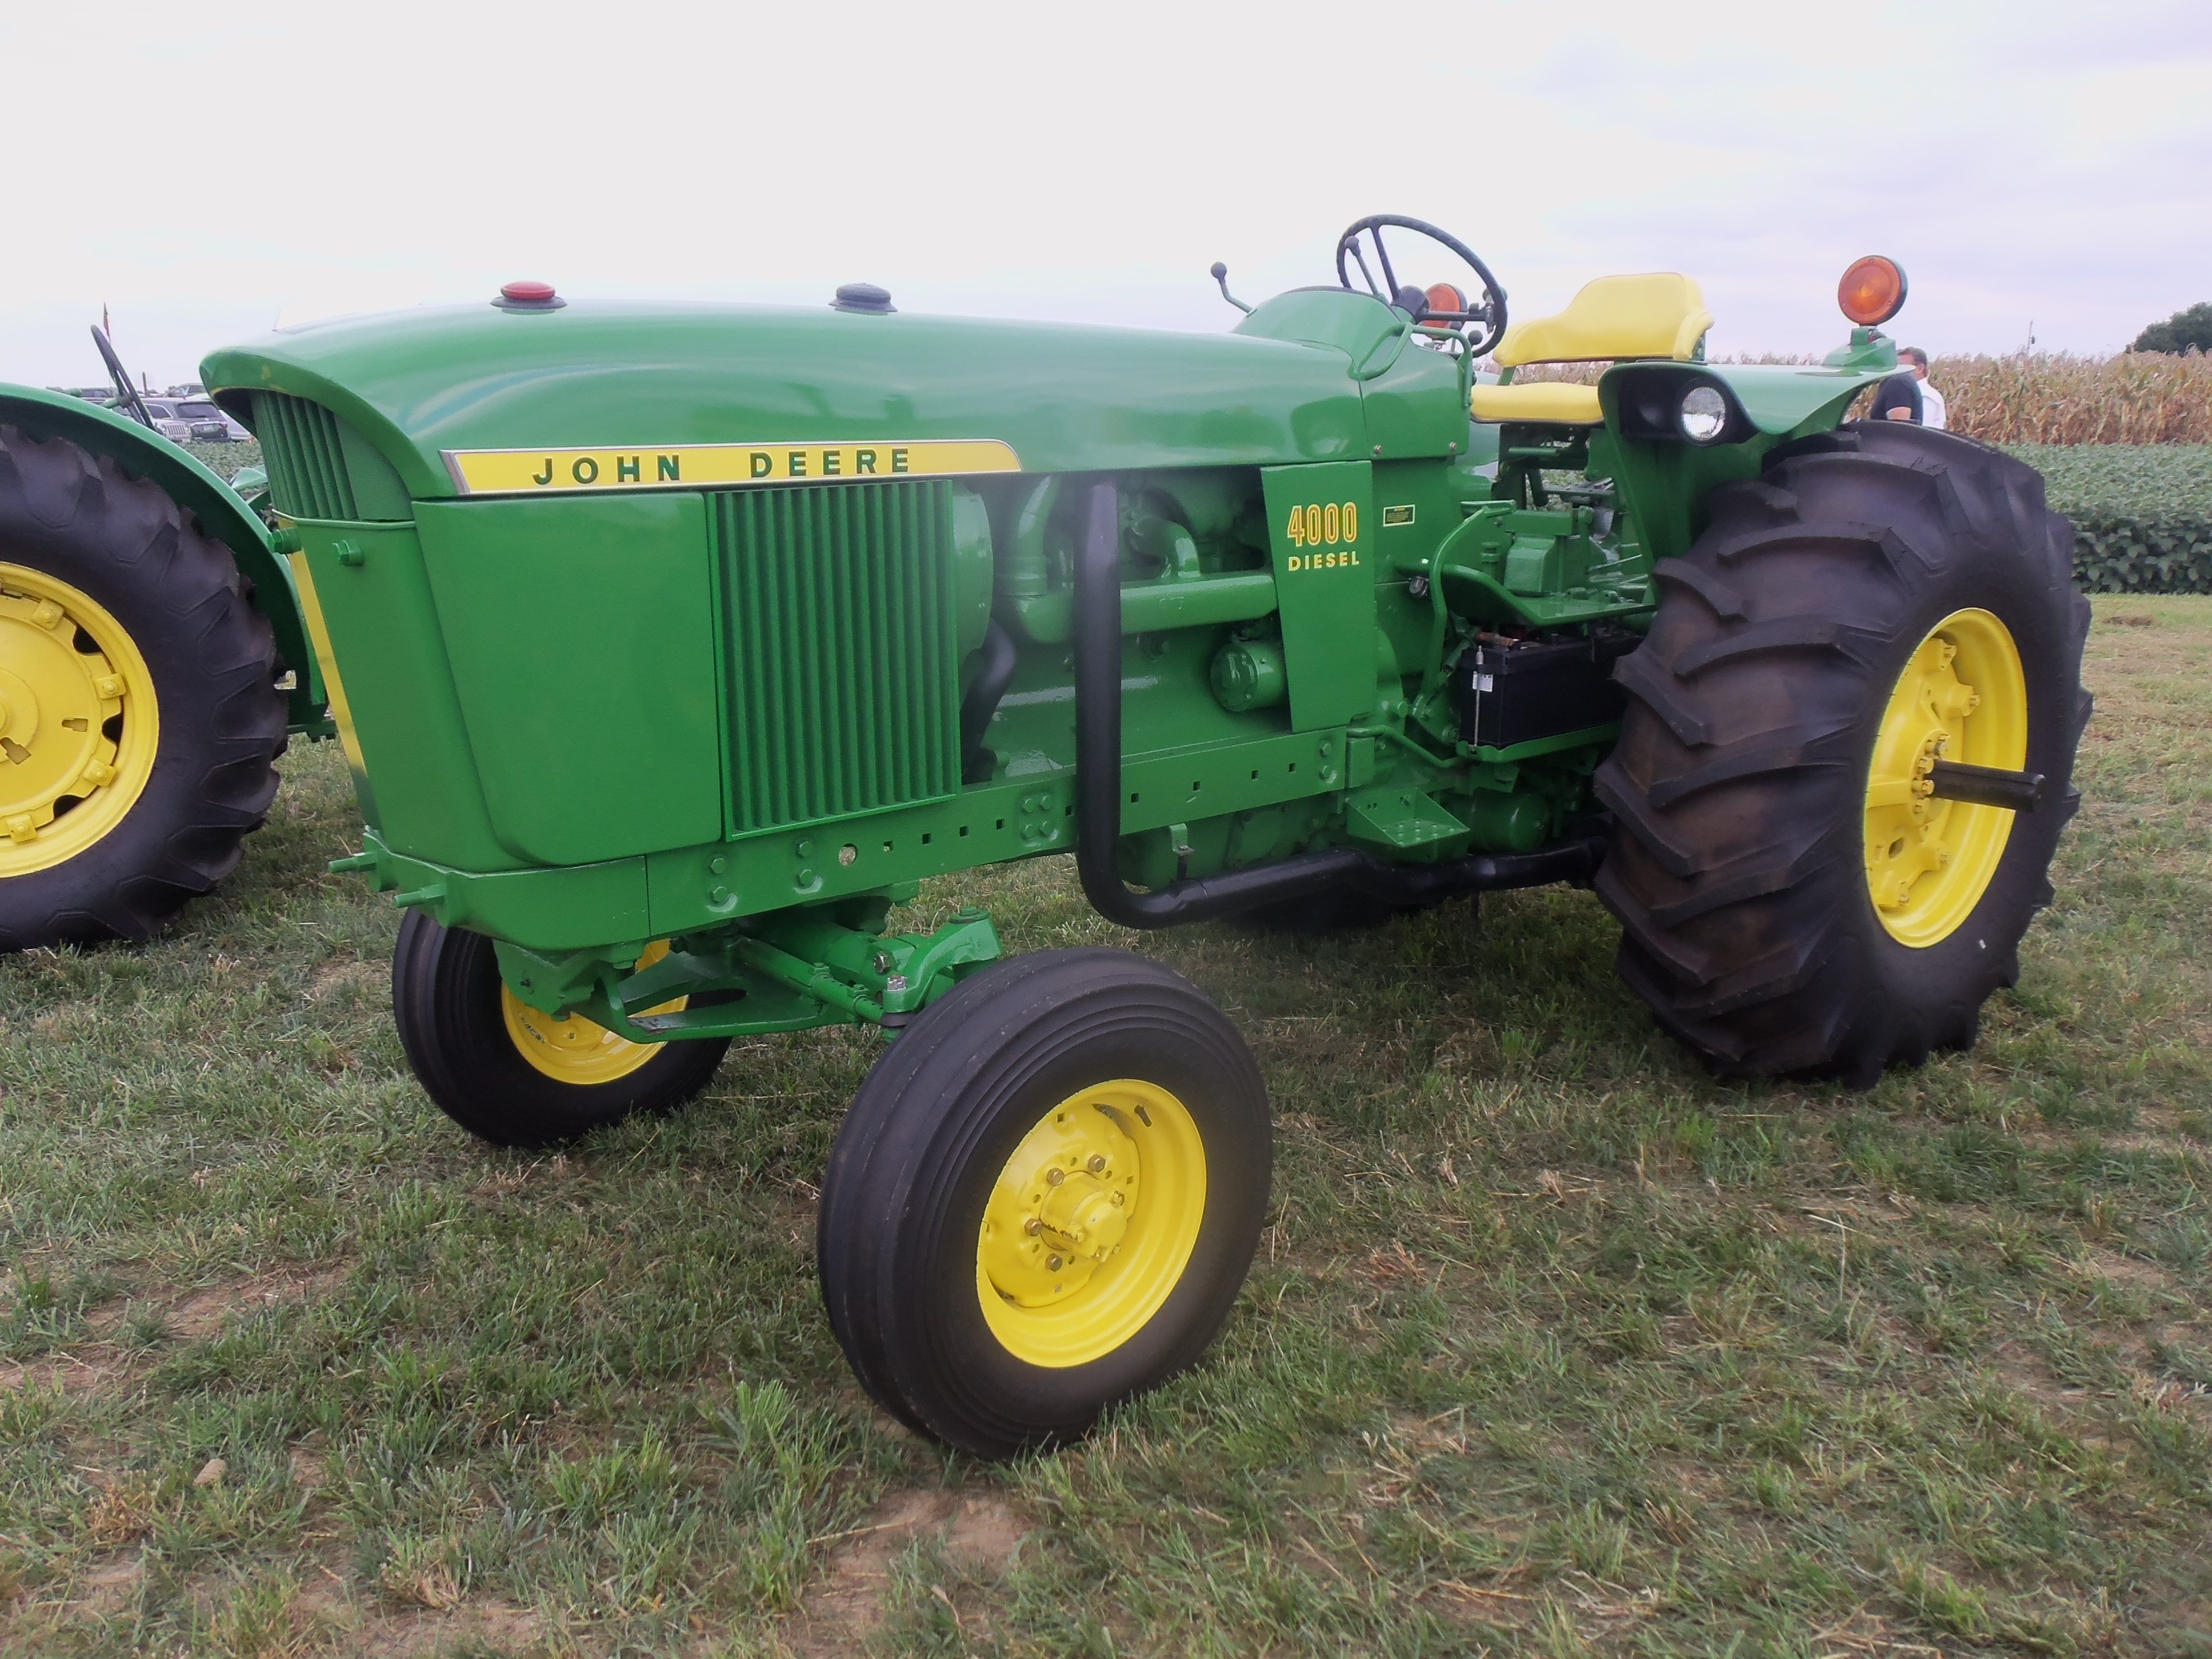 Low Profile Tractor : Hp john deere low profile rial number r